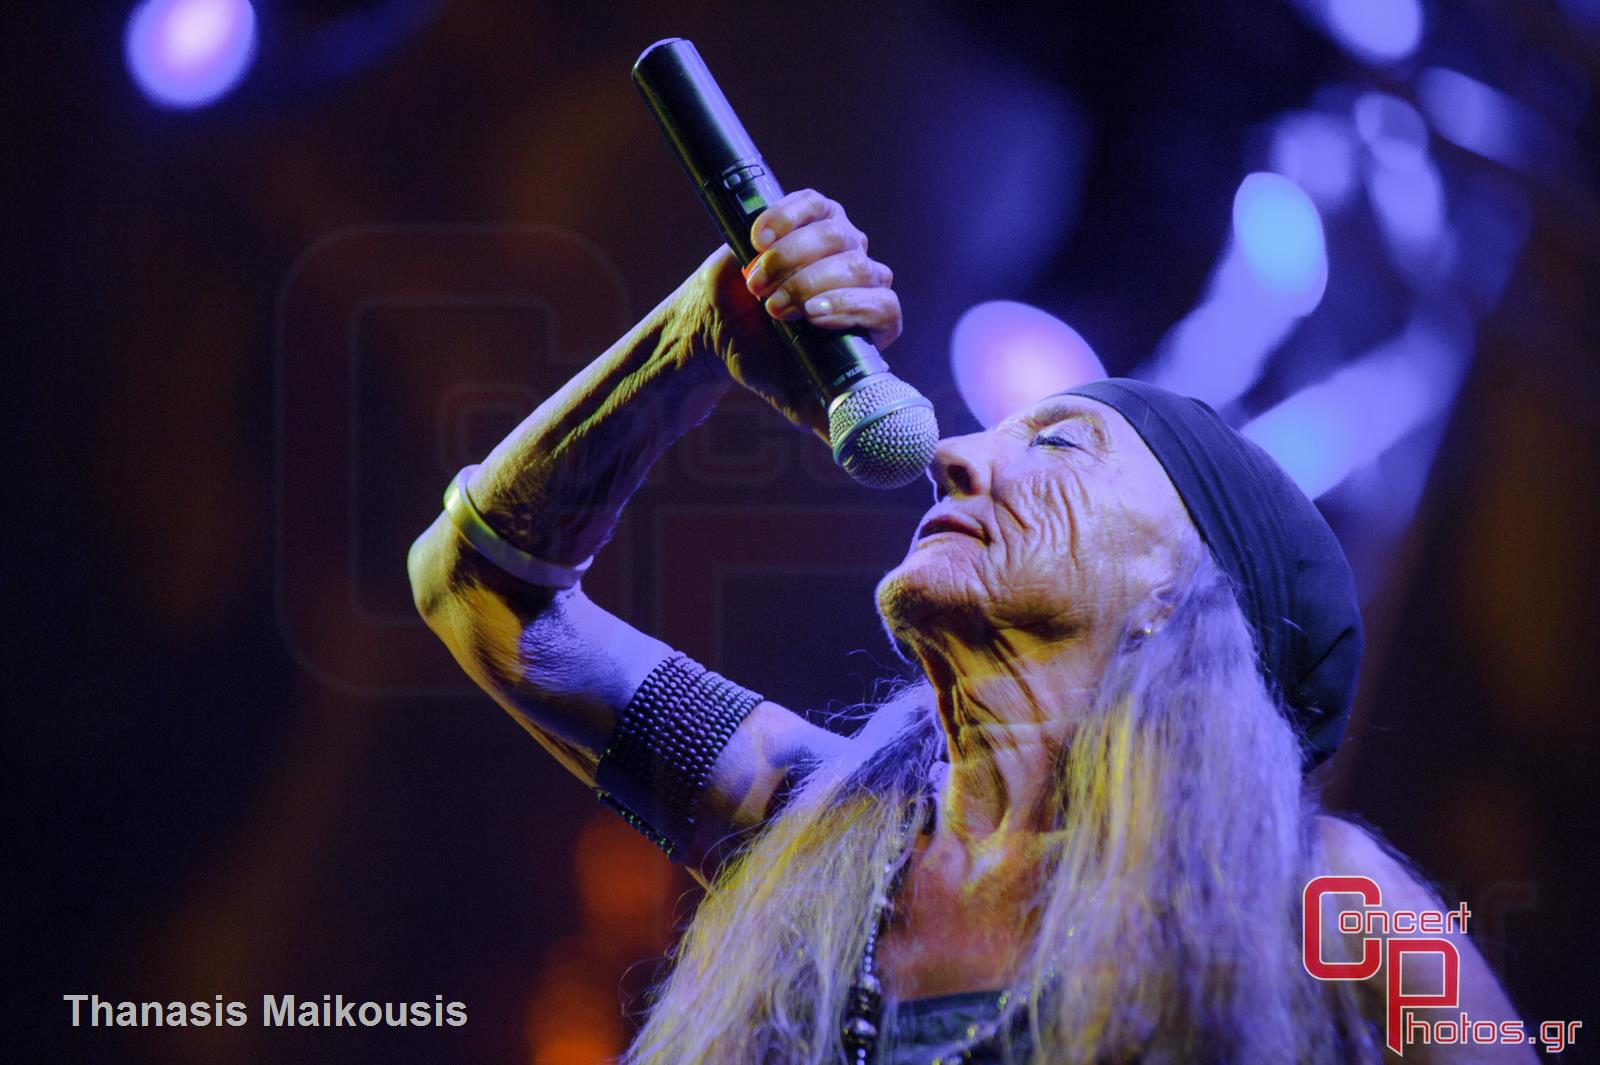 Active Member - Τραγούδα μας να φύγει το σκοτάδι- photographer: Thanasis Maikousis - concertphotos_-5952